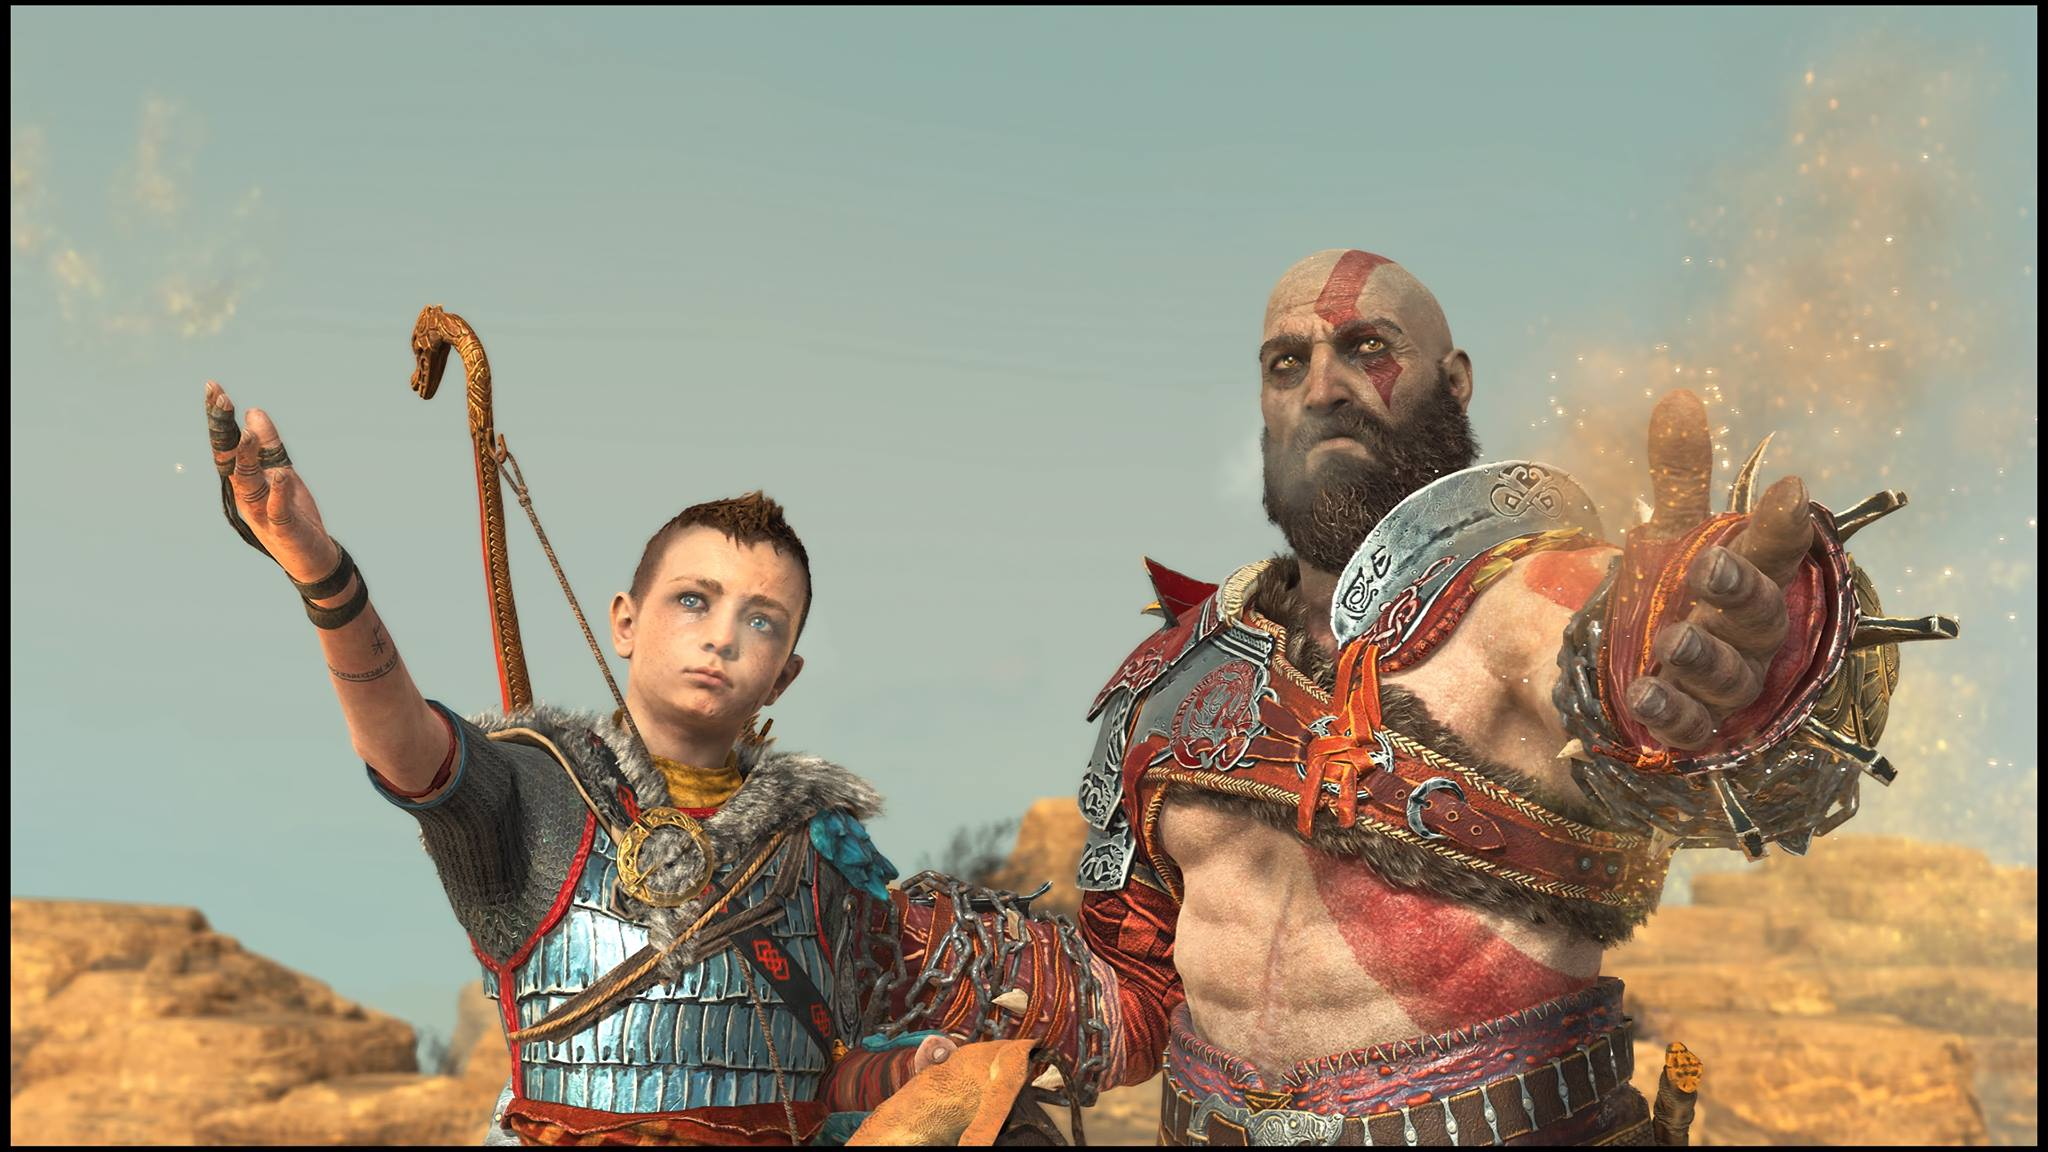 atreus god of war (2018) kratos video games god of war screen shot santa monica studio